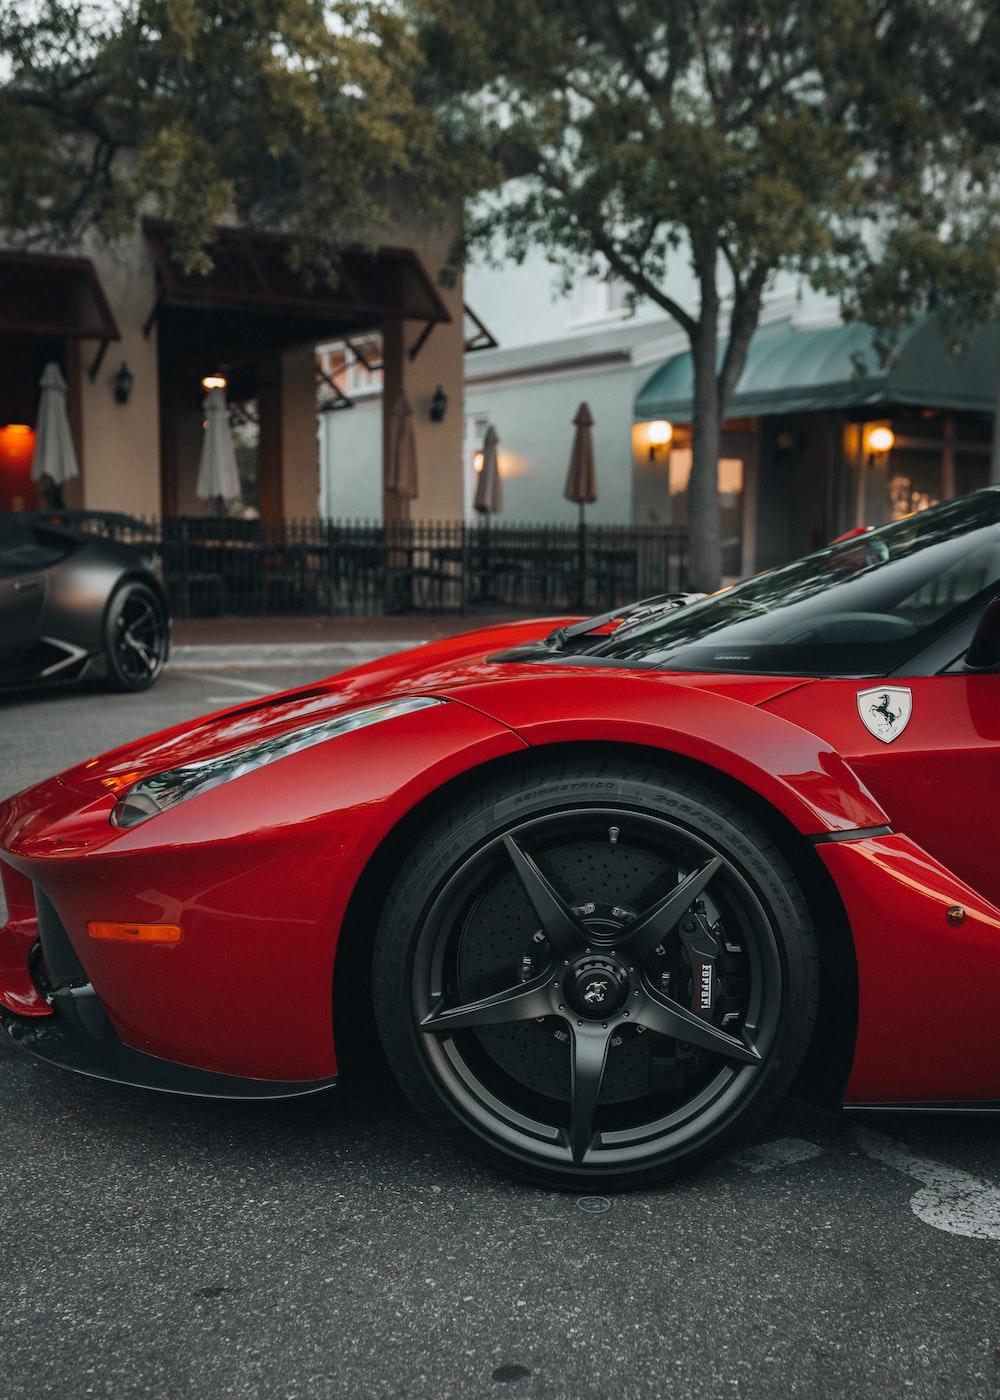 red ferrari 458 italia parked on street during daytime